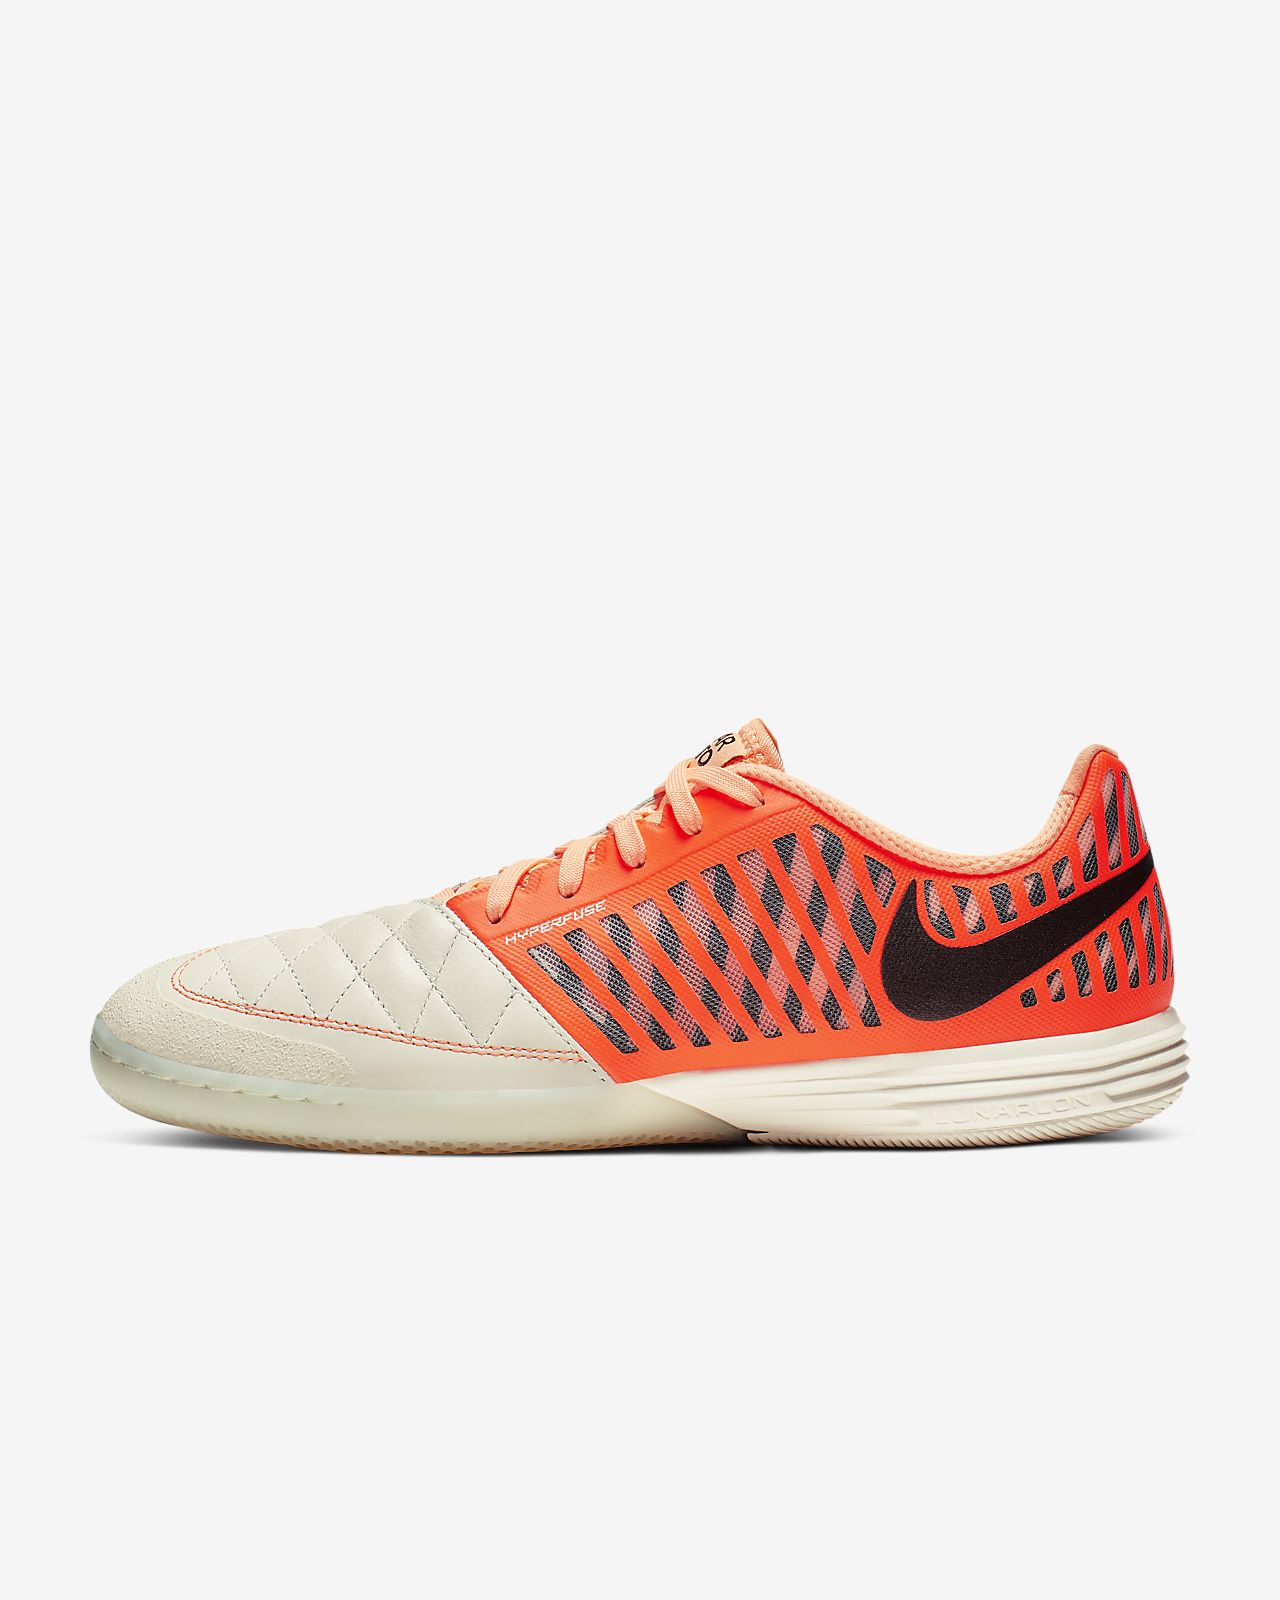 FC247 LunarGato II Football Shoe